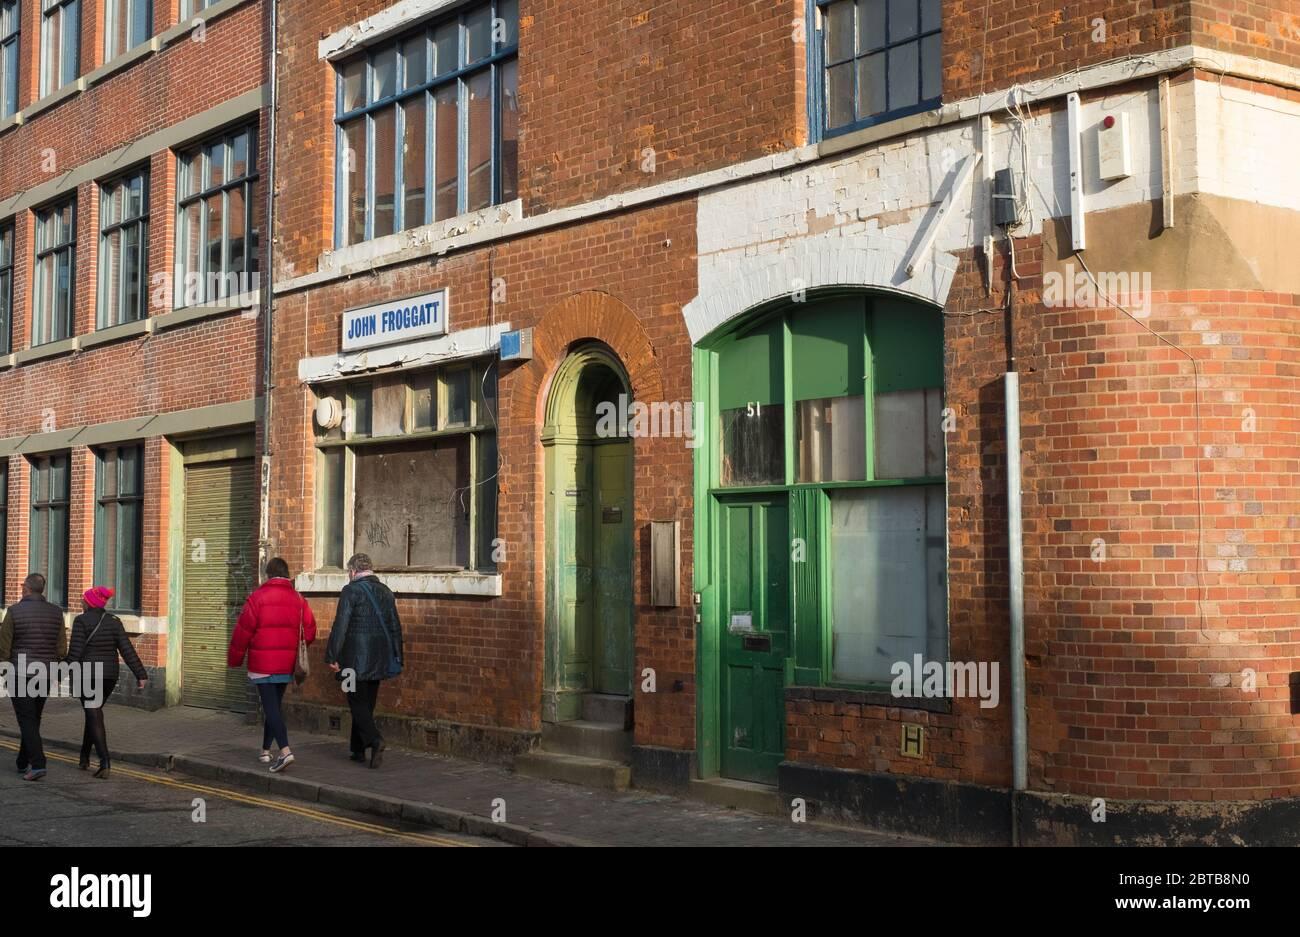 Derelict former John Froggatt premises, Vittoria Street, Birmingham Stock Photo